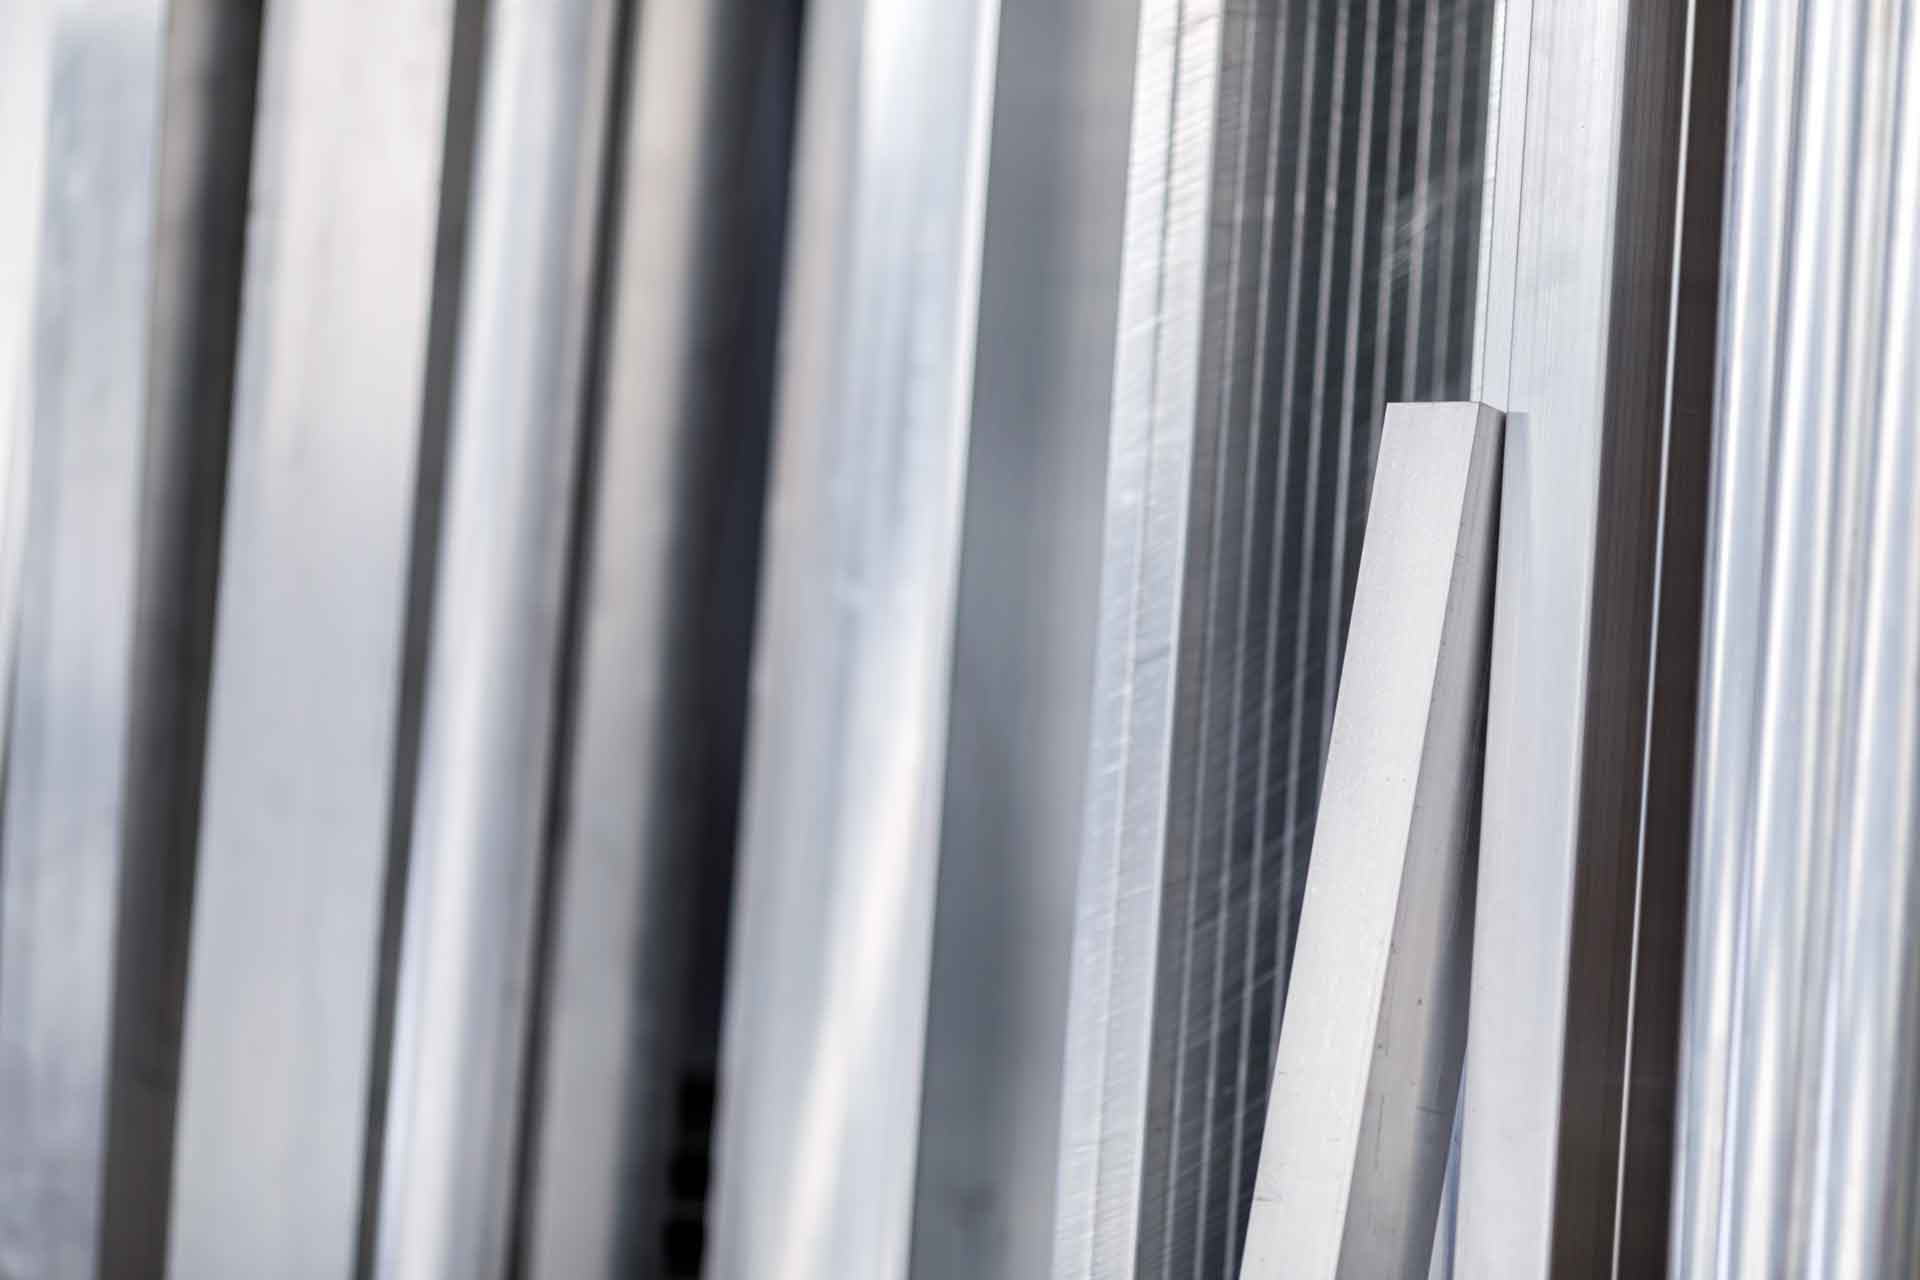 Smelter aluminium